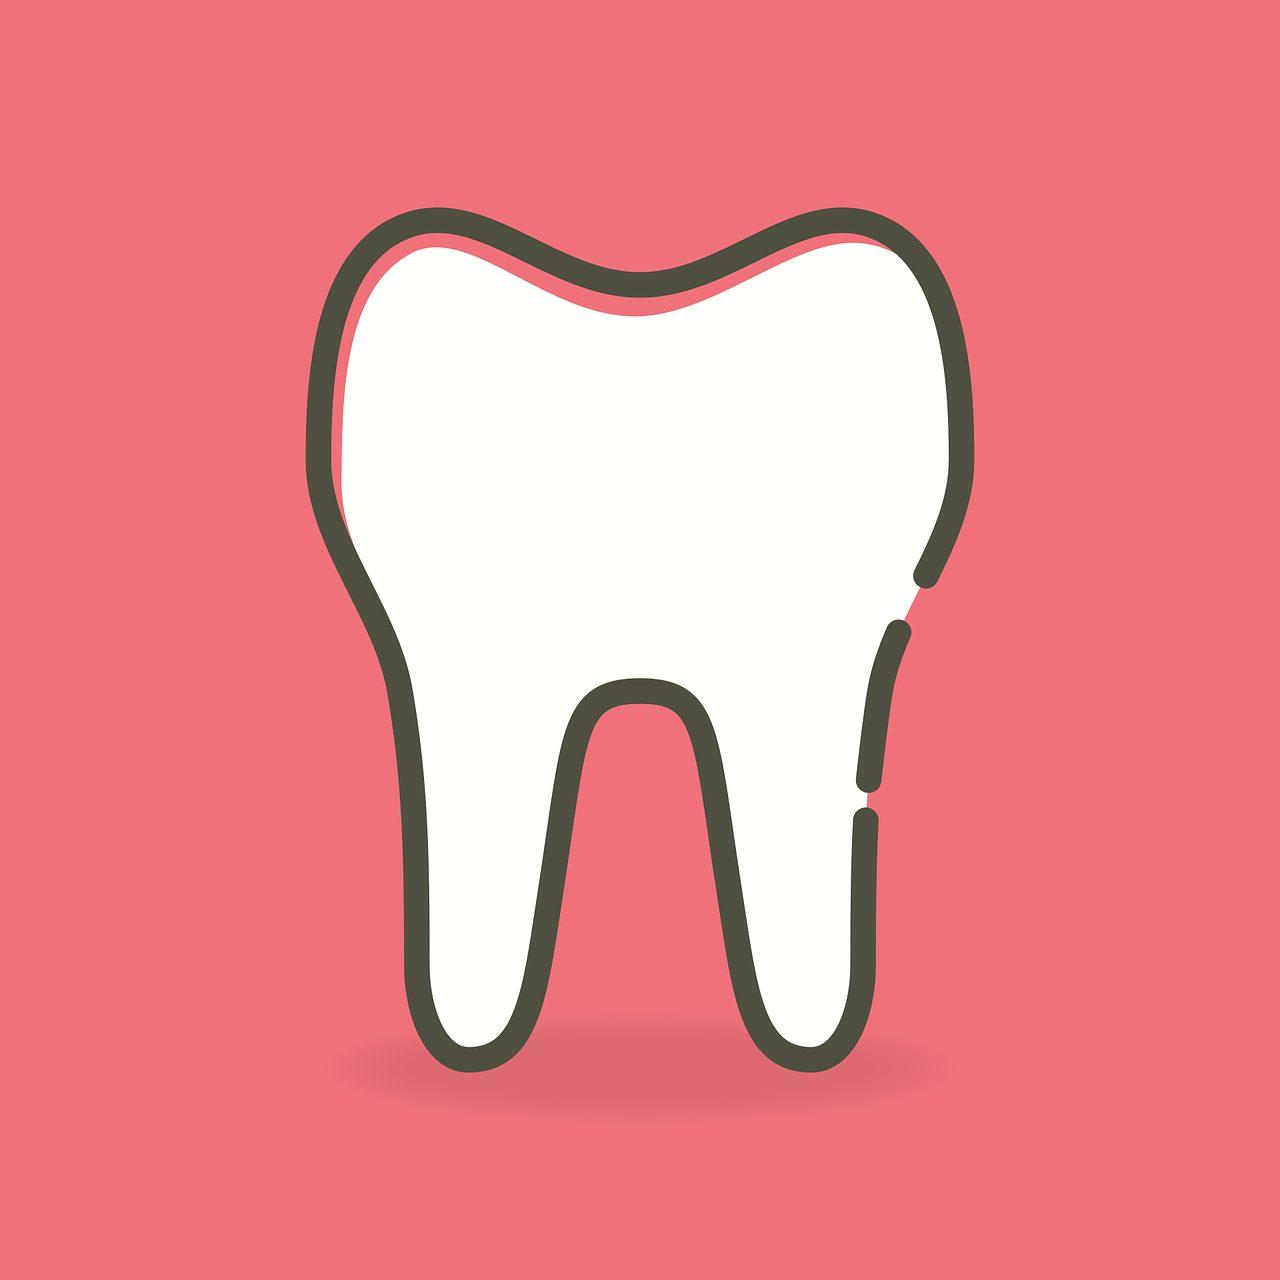 Deitmers Tandartspraktijk N B J wanneer spoed tandarts